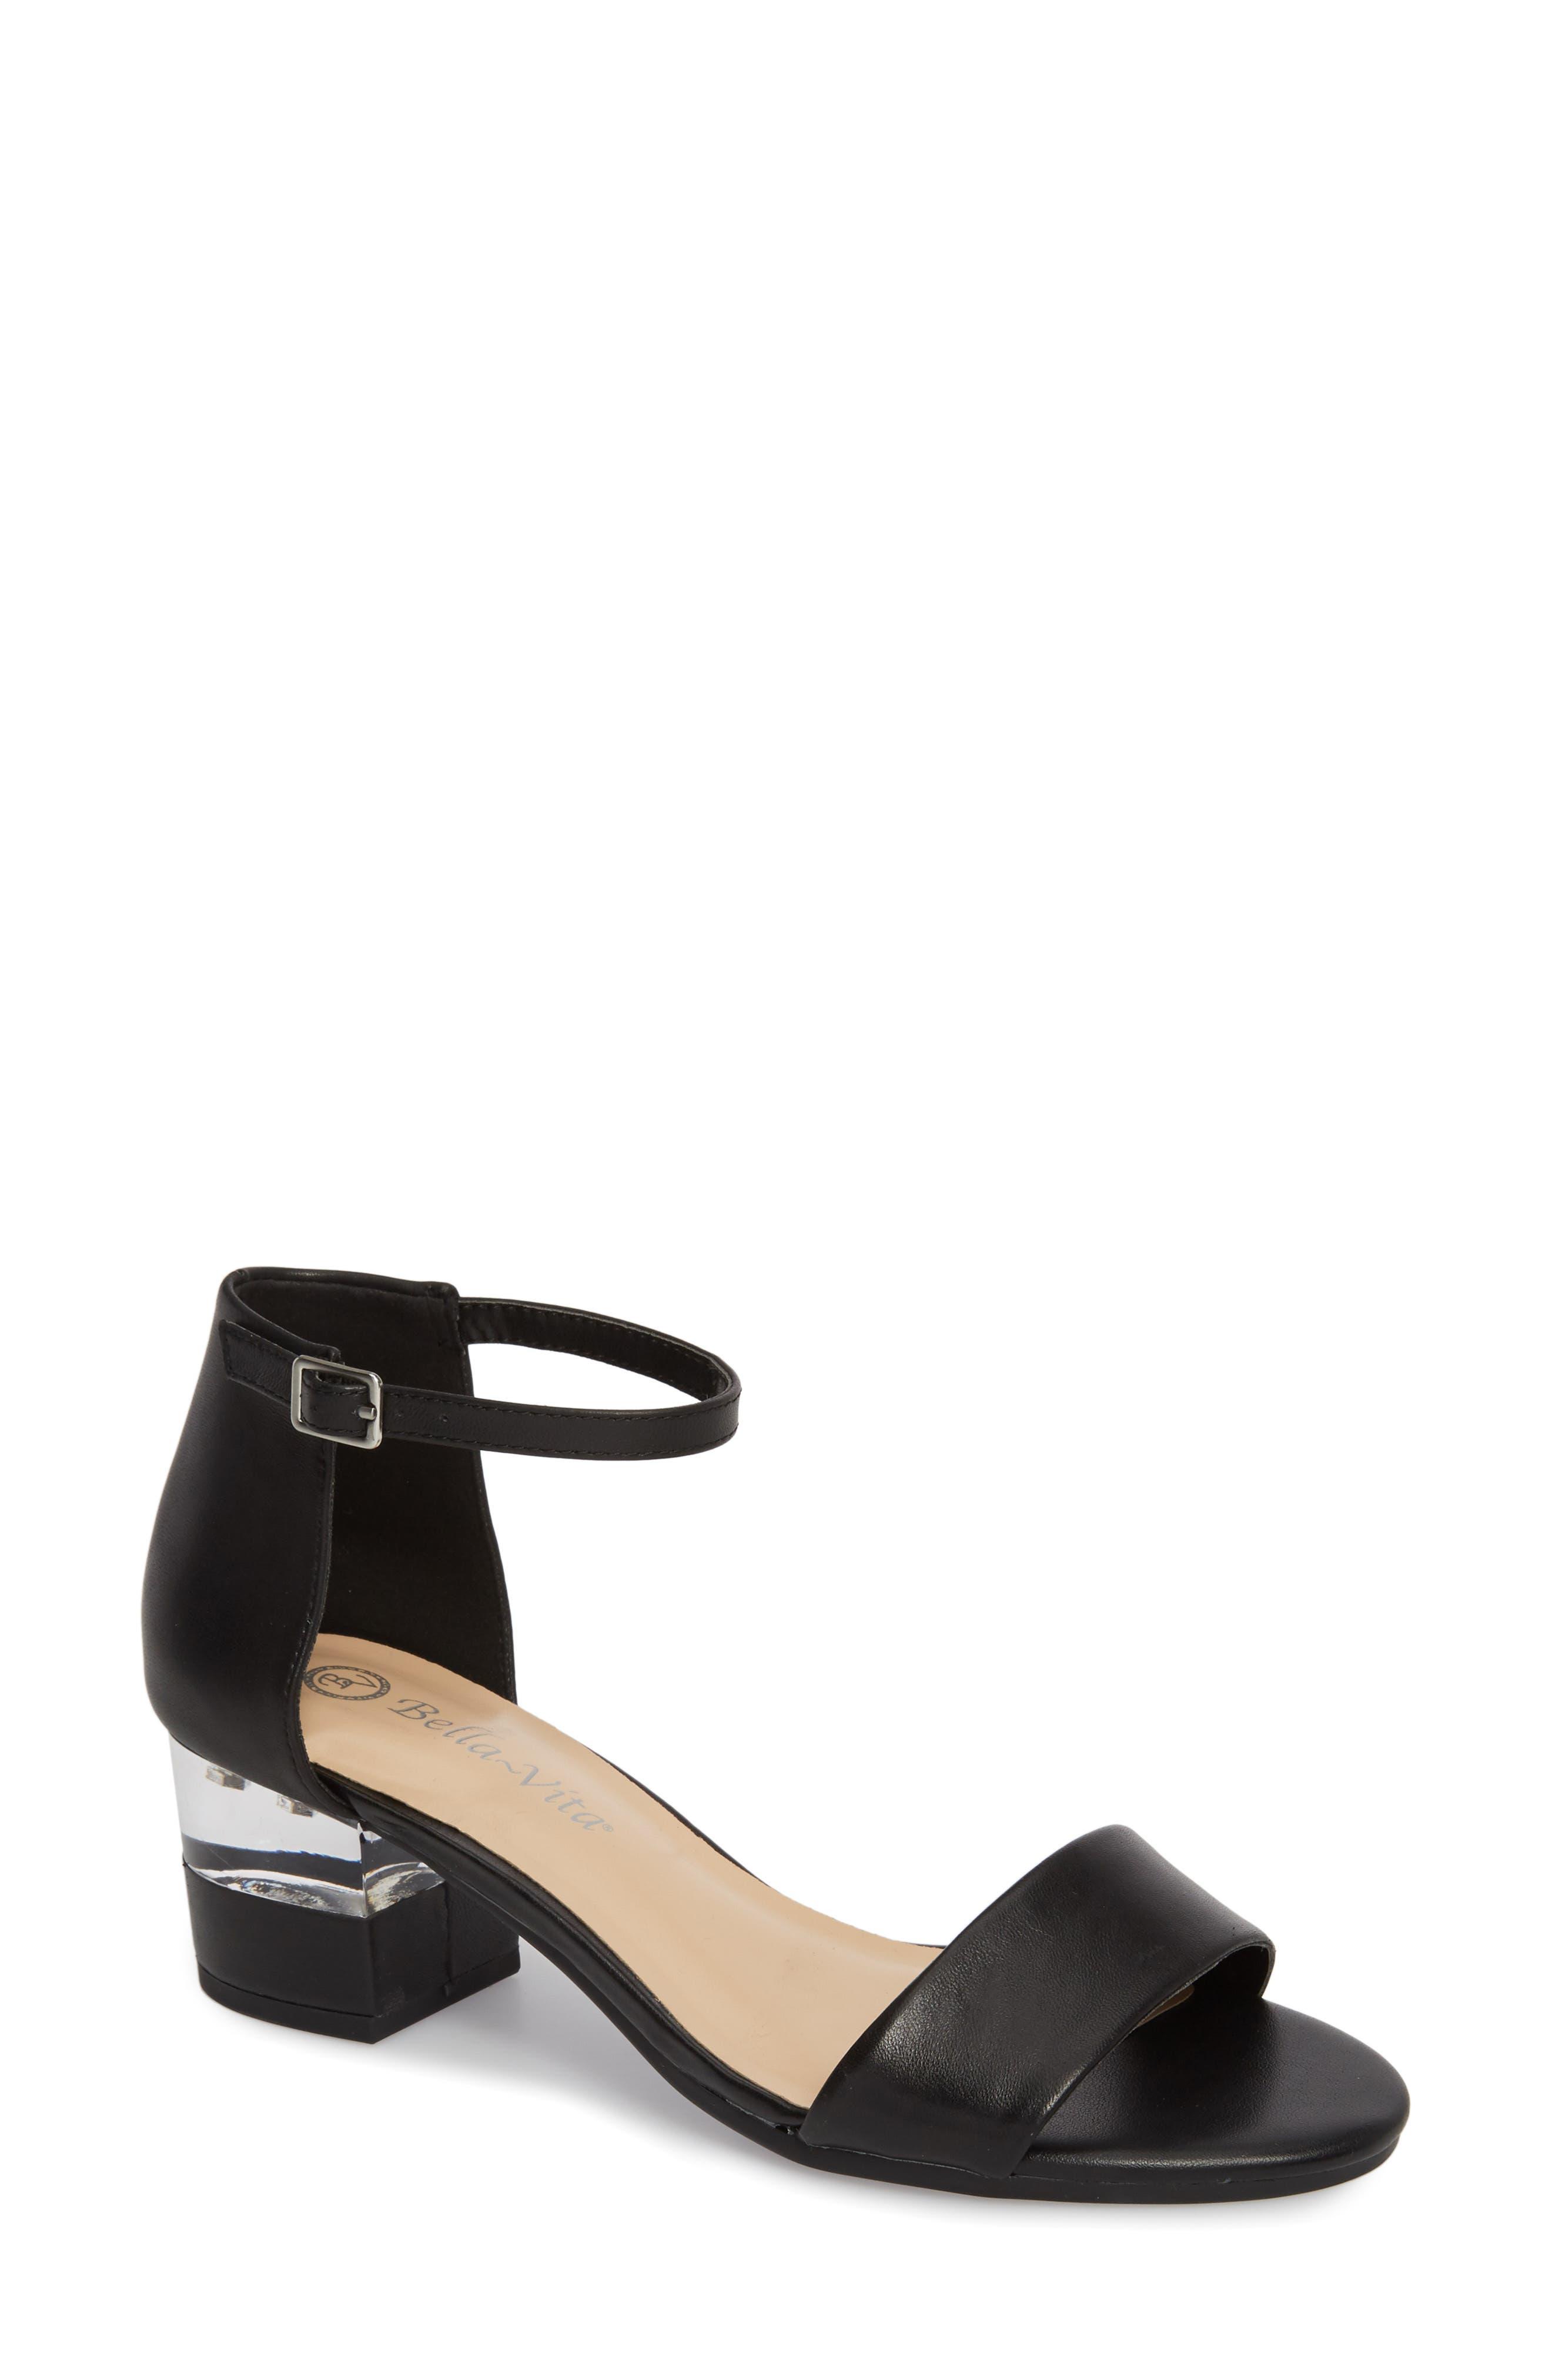 Fitz Block Heel Sandal,                         Main,                         color, BLACK LEATHER